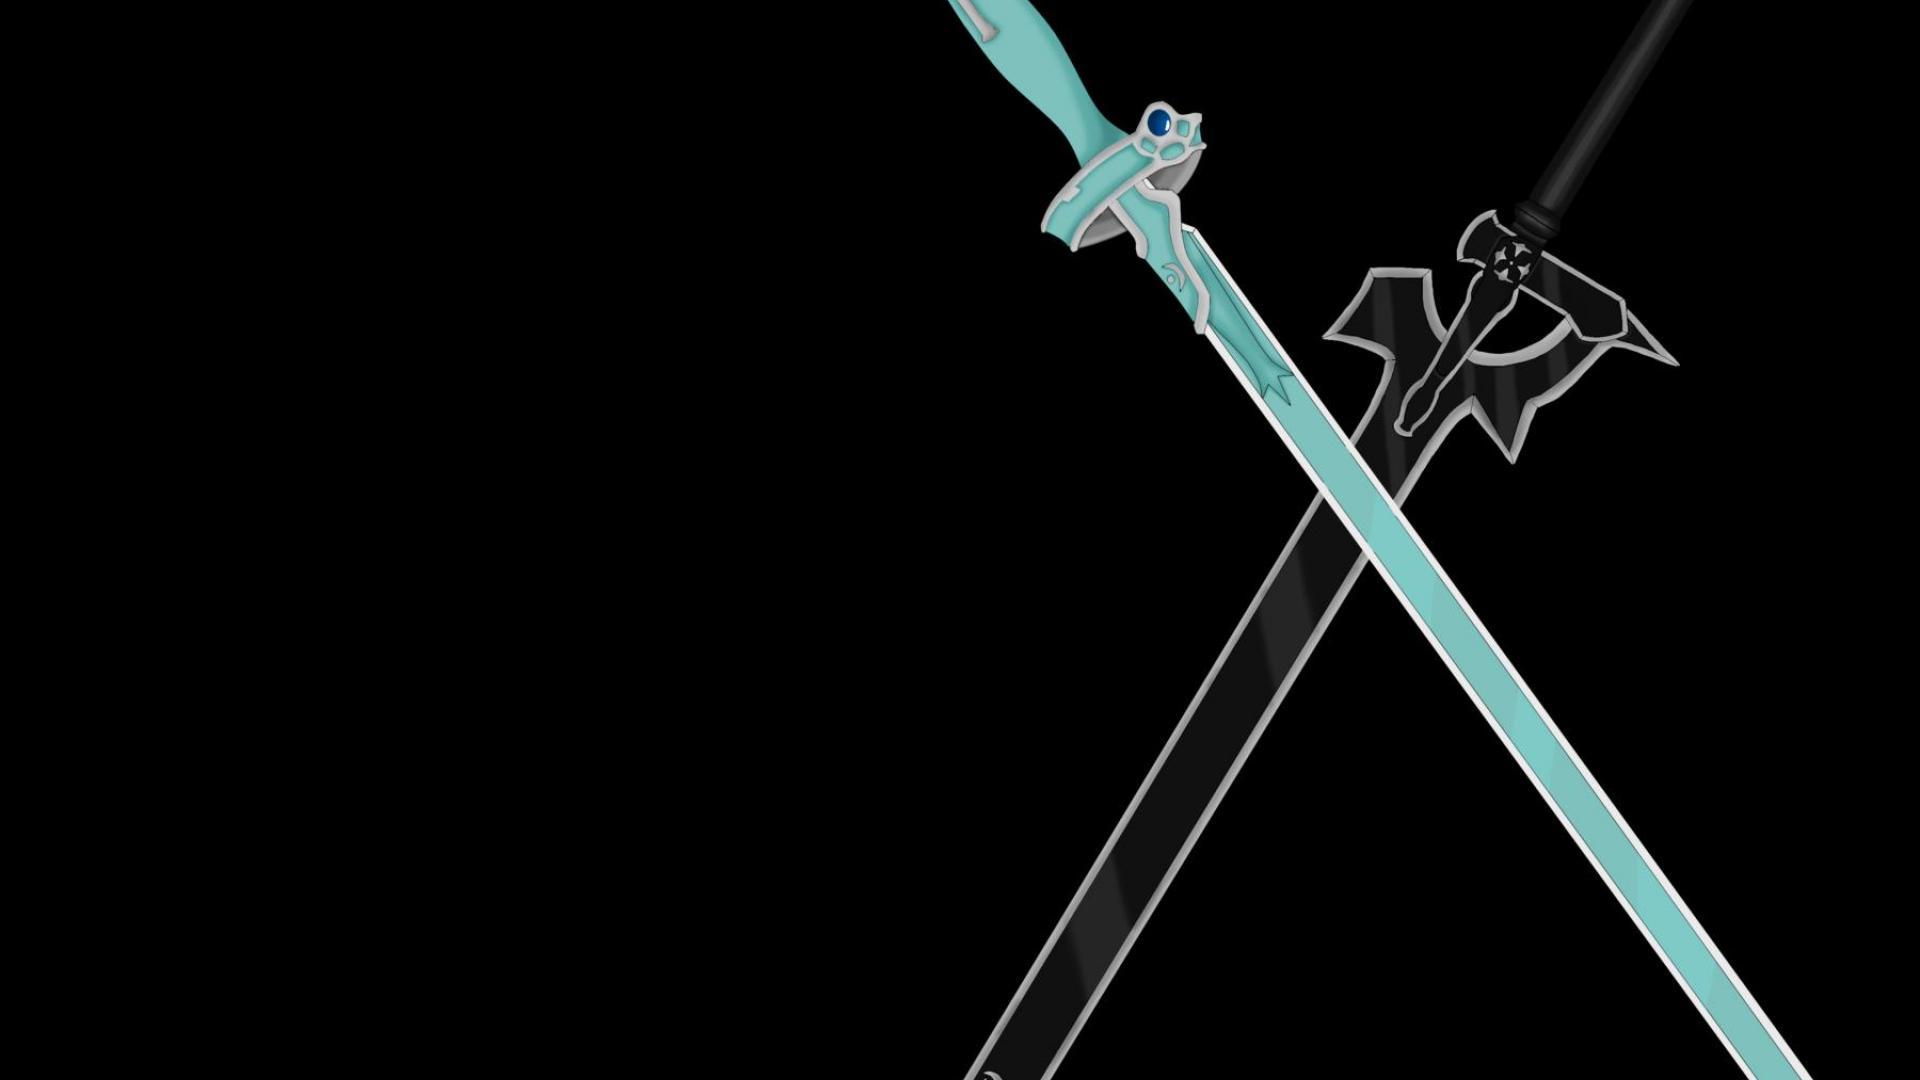 hd wallaper sao sword - photo #2